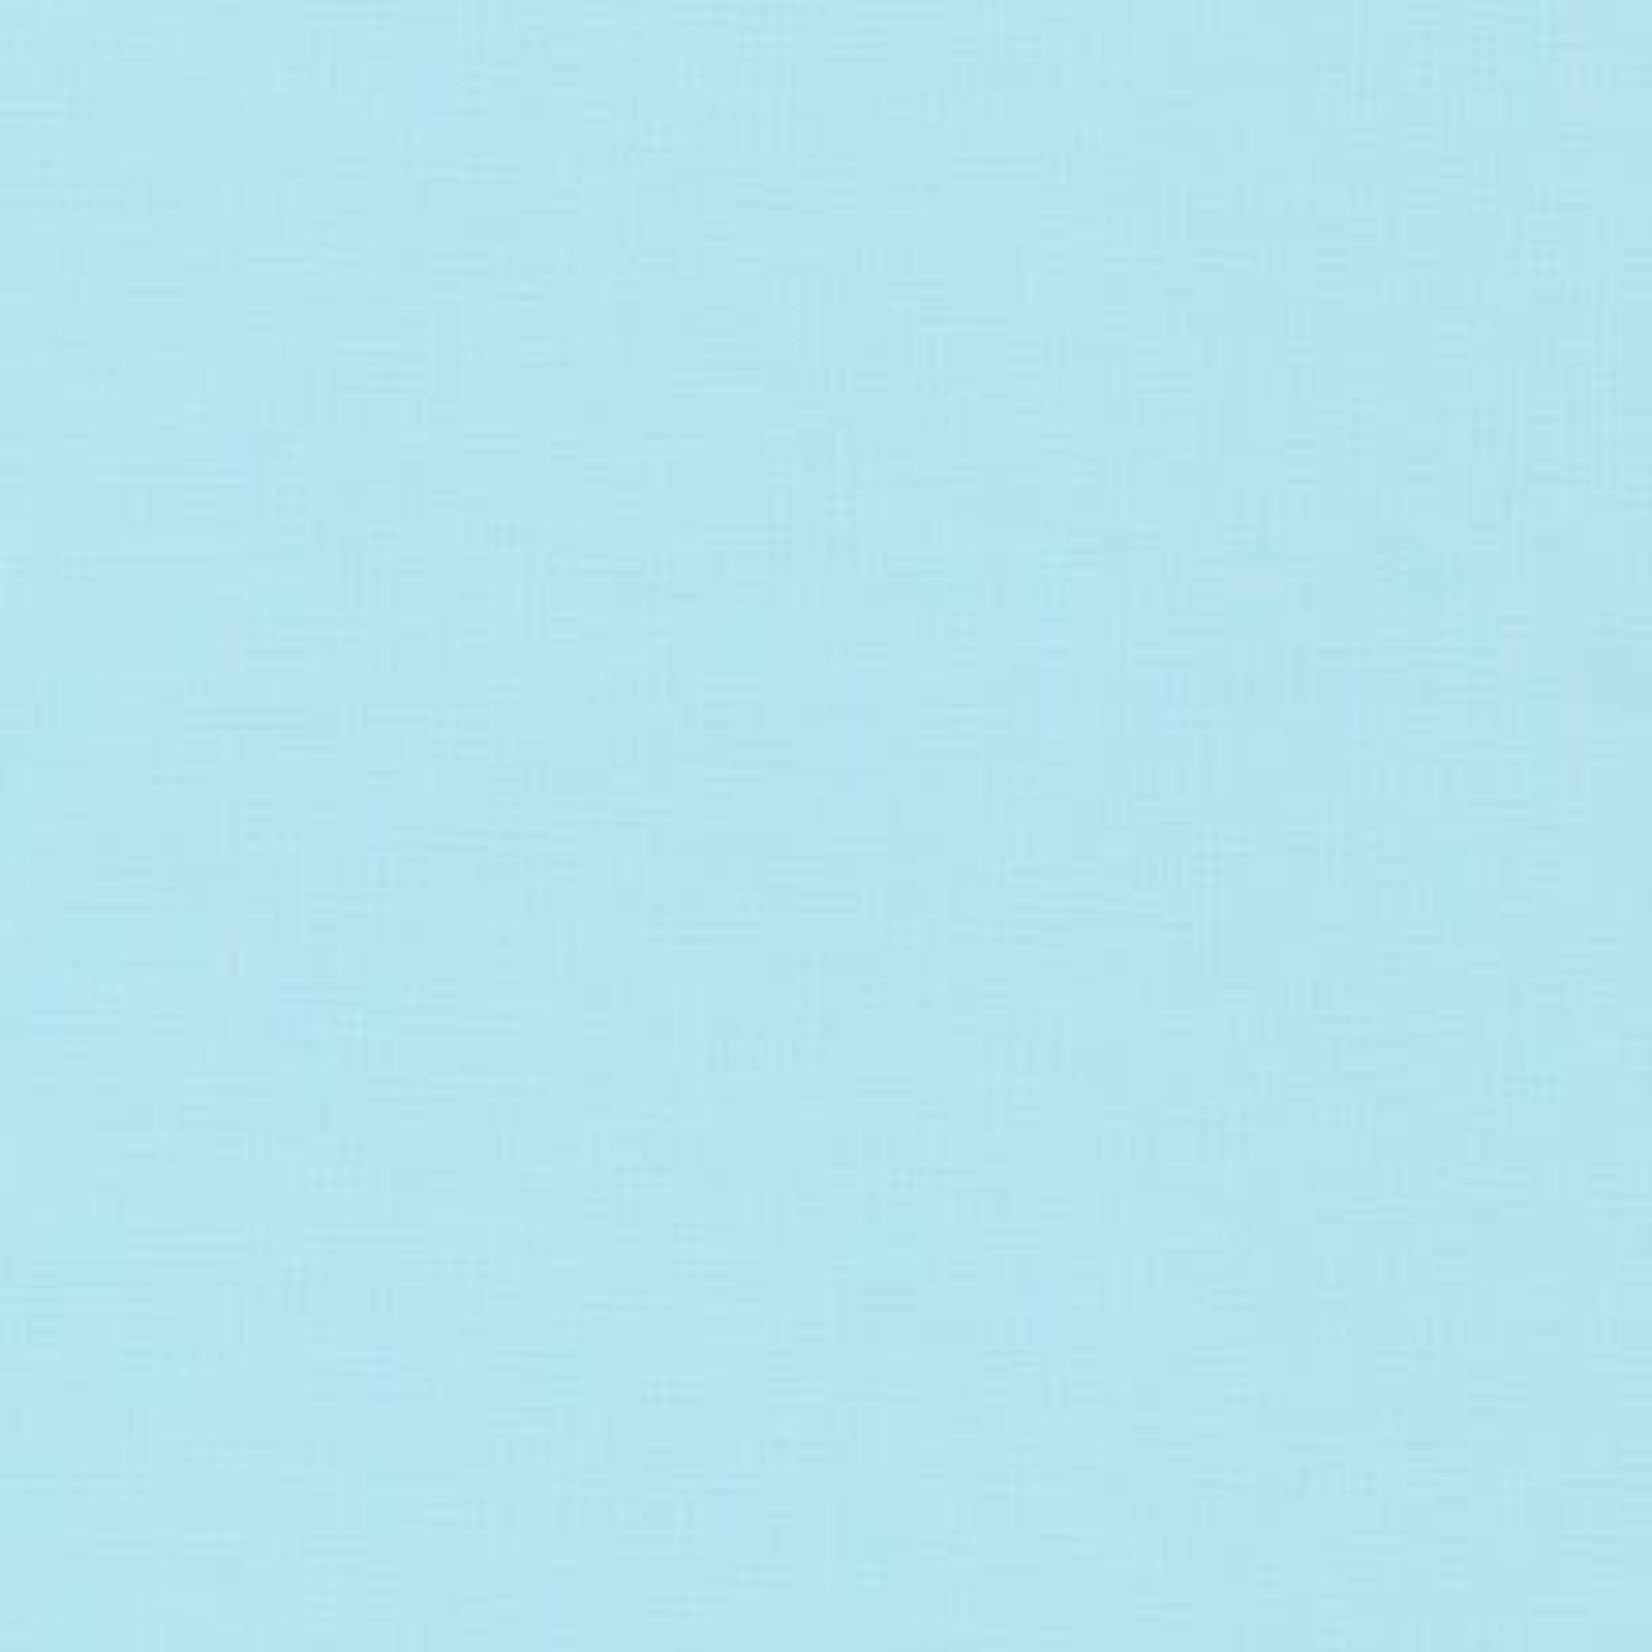 KONA KONA  K001-1010 BABY BLUE, PER CM OR $14/M